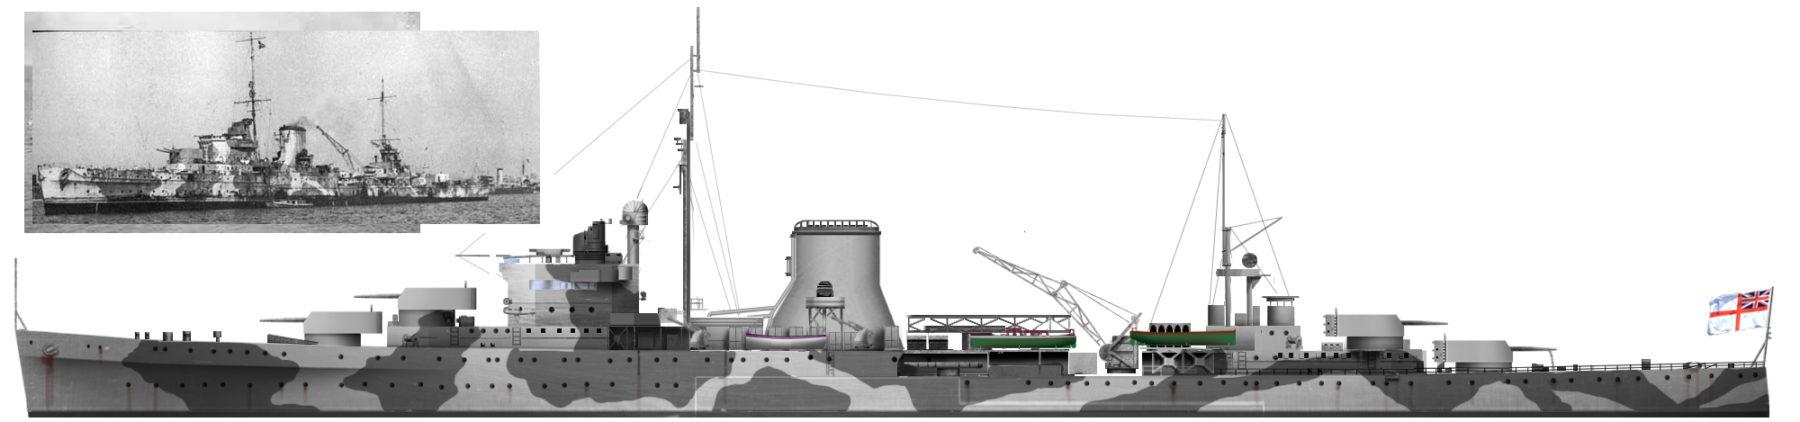 HMS Orion in Crete, 1941 - Author's HD Illustration